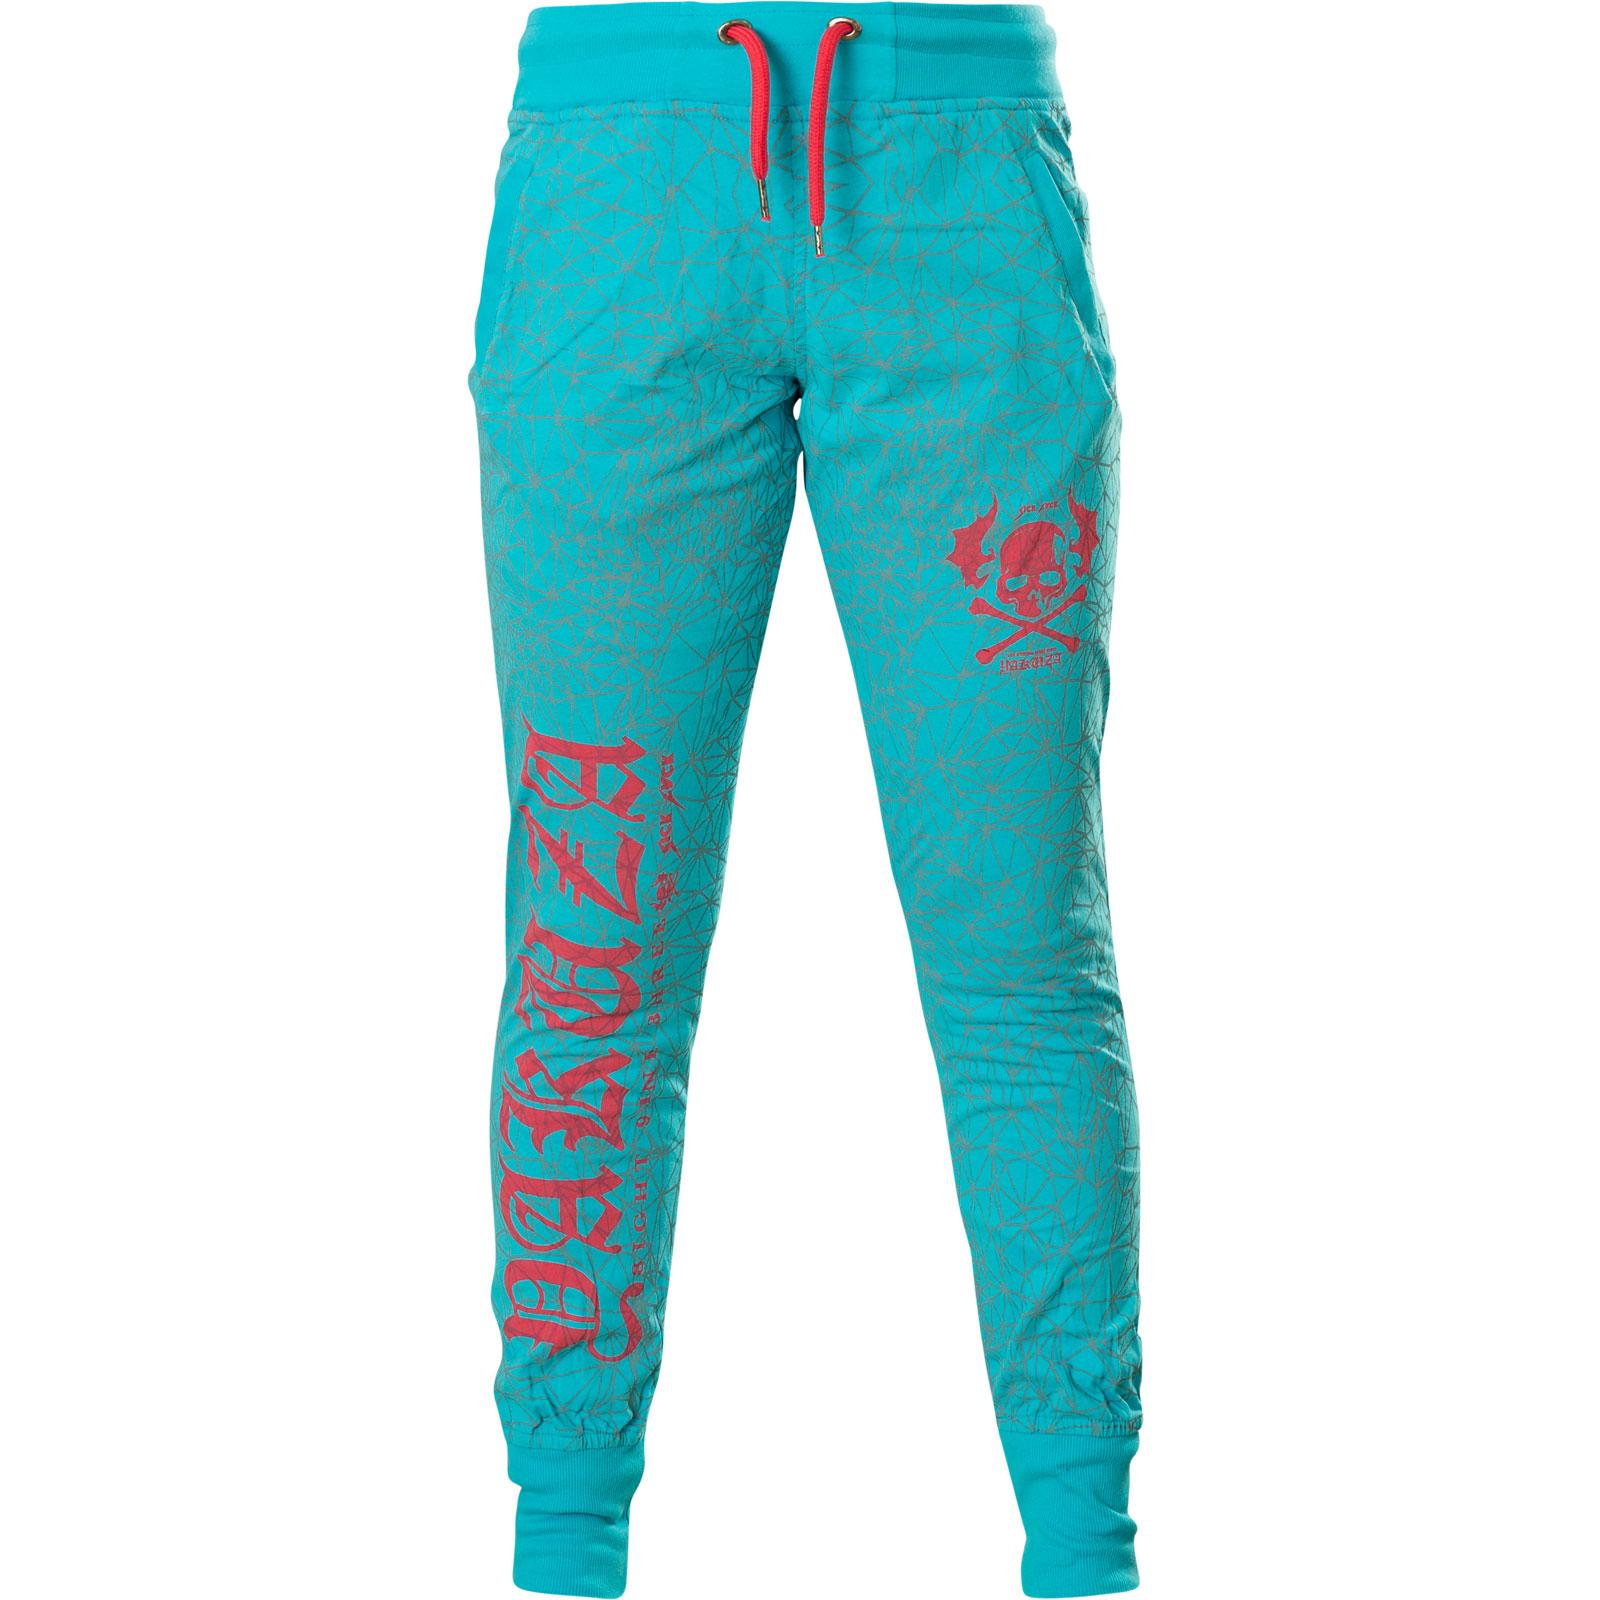 Yakuza Sweatpants Badge Jogger JOB-13047 Ebony